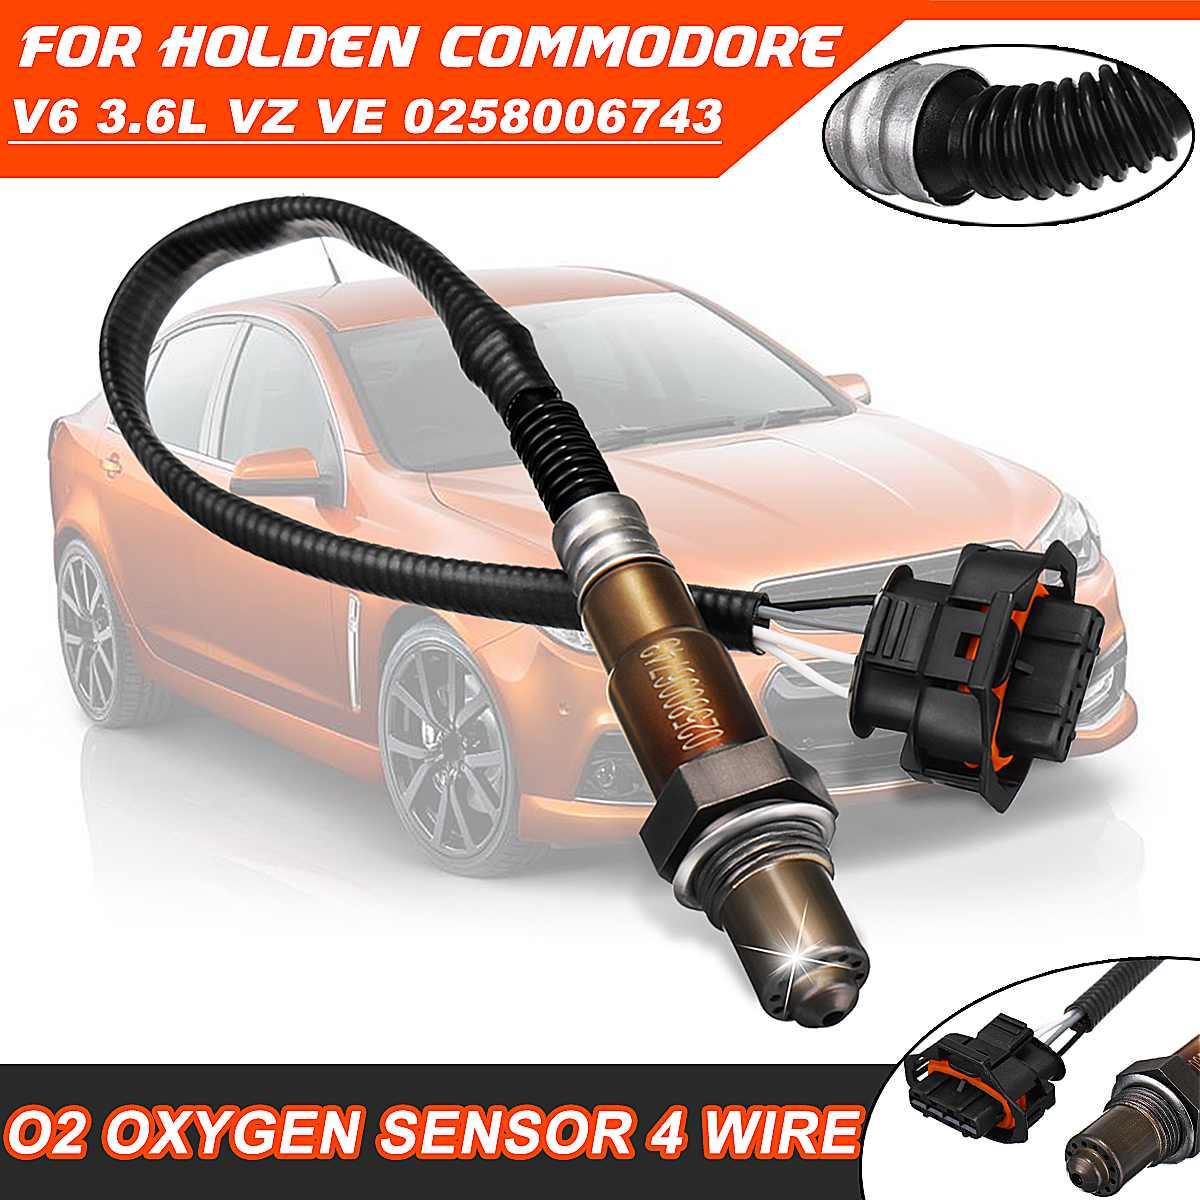 #02580067434 draht O2 Sauerstoff Sensor Für Holden Commodore VZ LE0 2004-2005 LY7 2005-2007 LW2 2007 -2008 V6 3.6L VZ VE